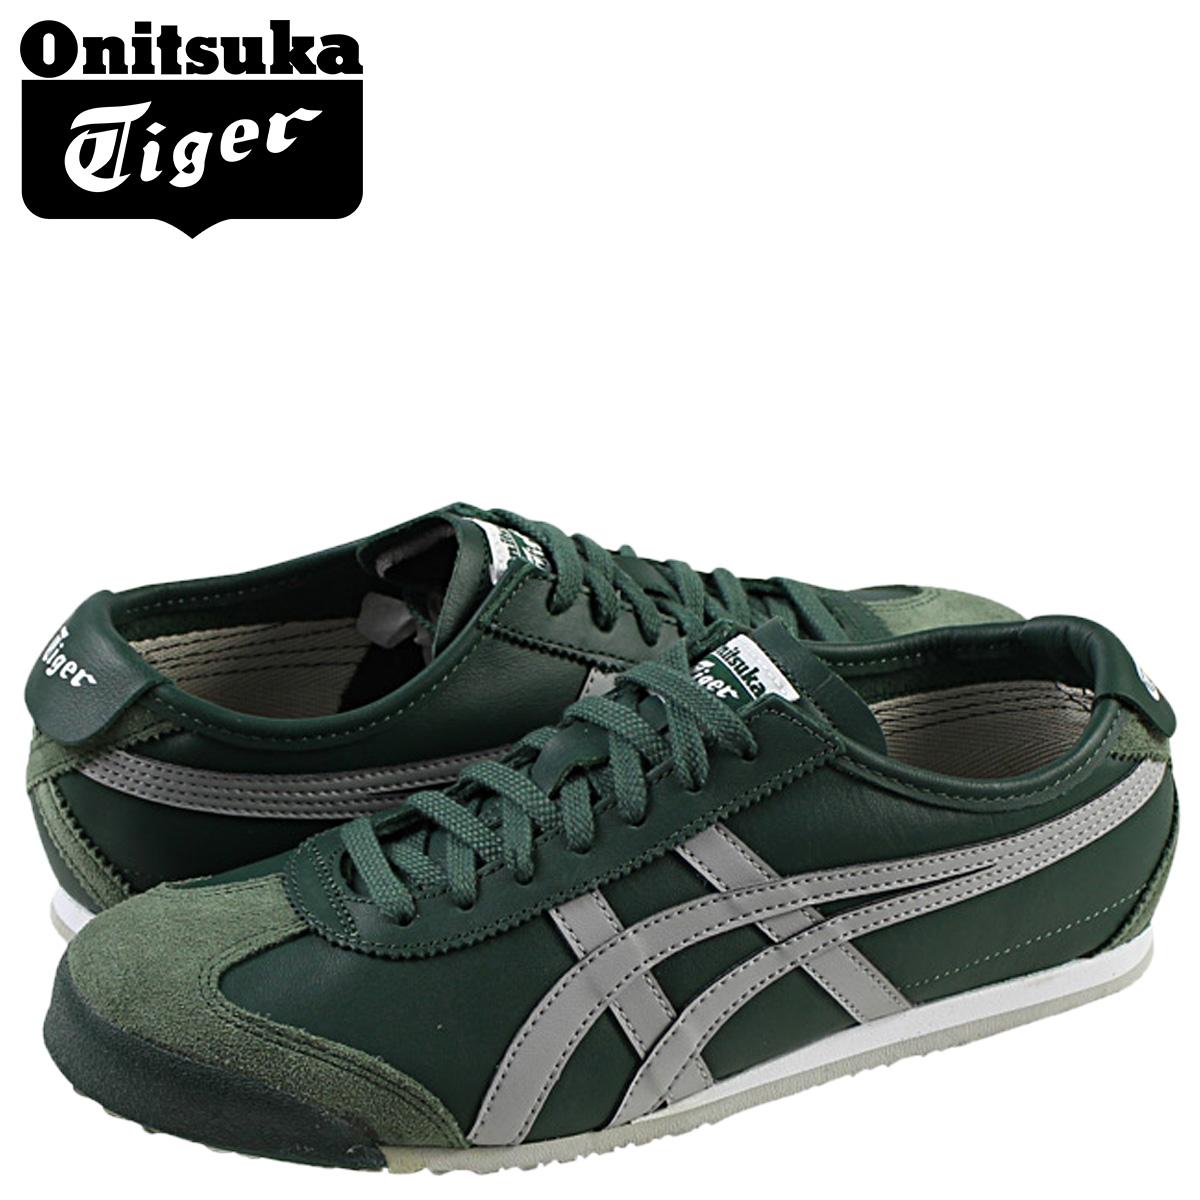 asics onitsuka tiger shoes online